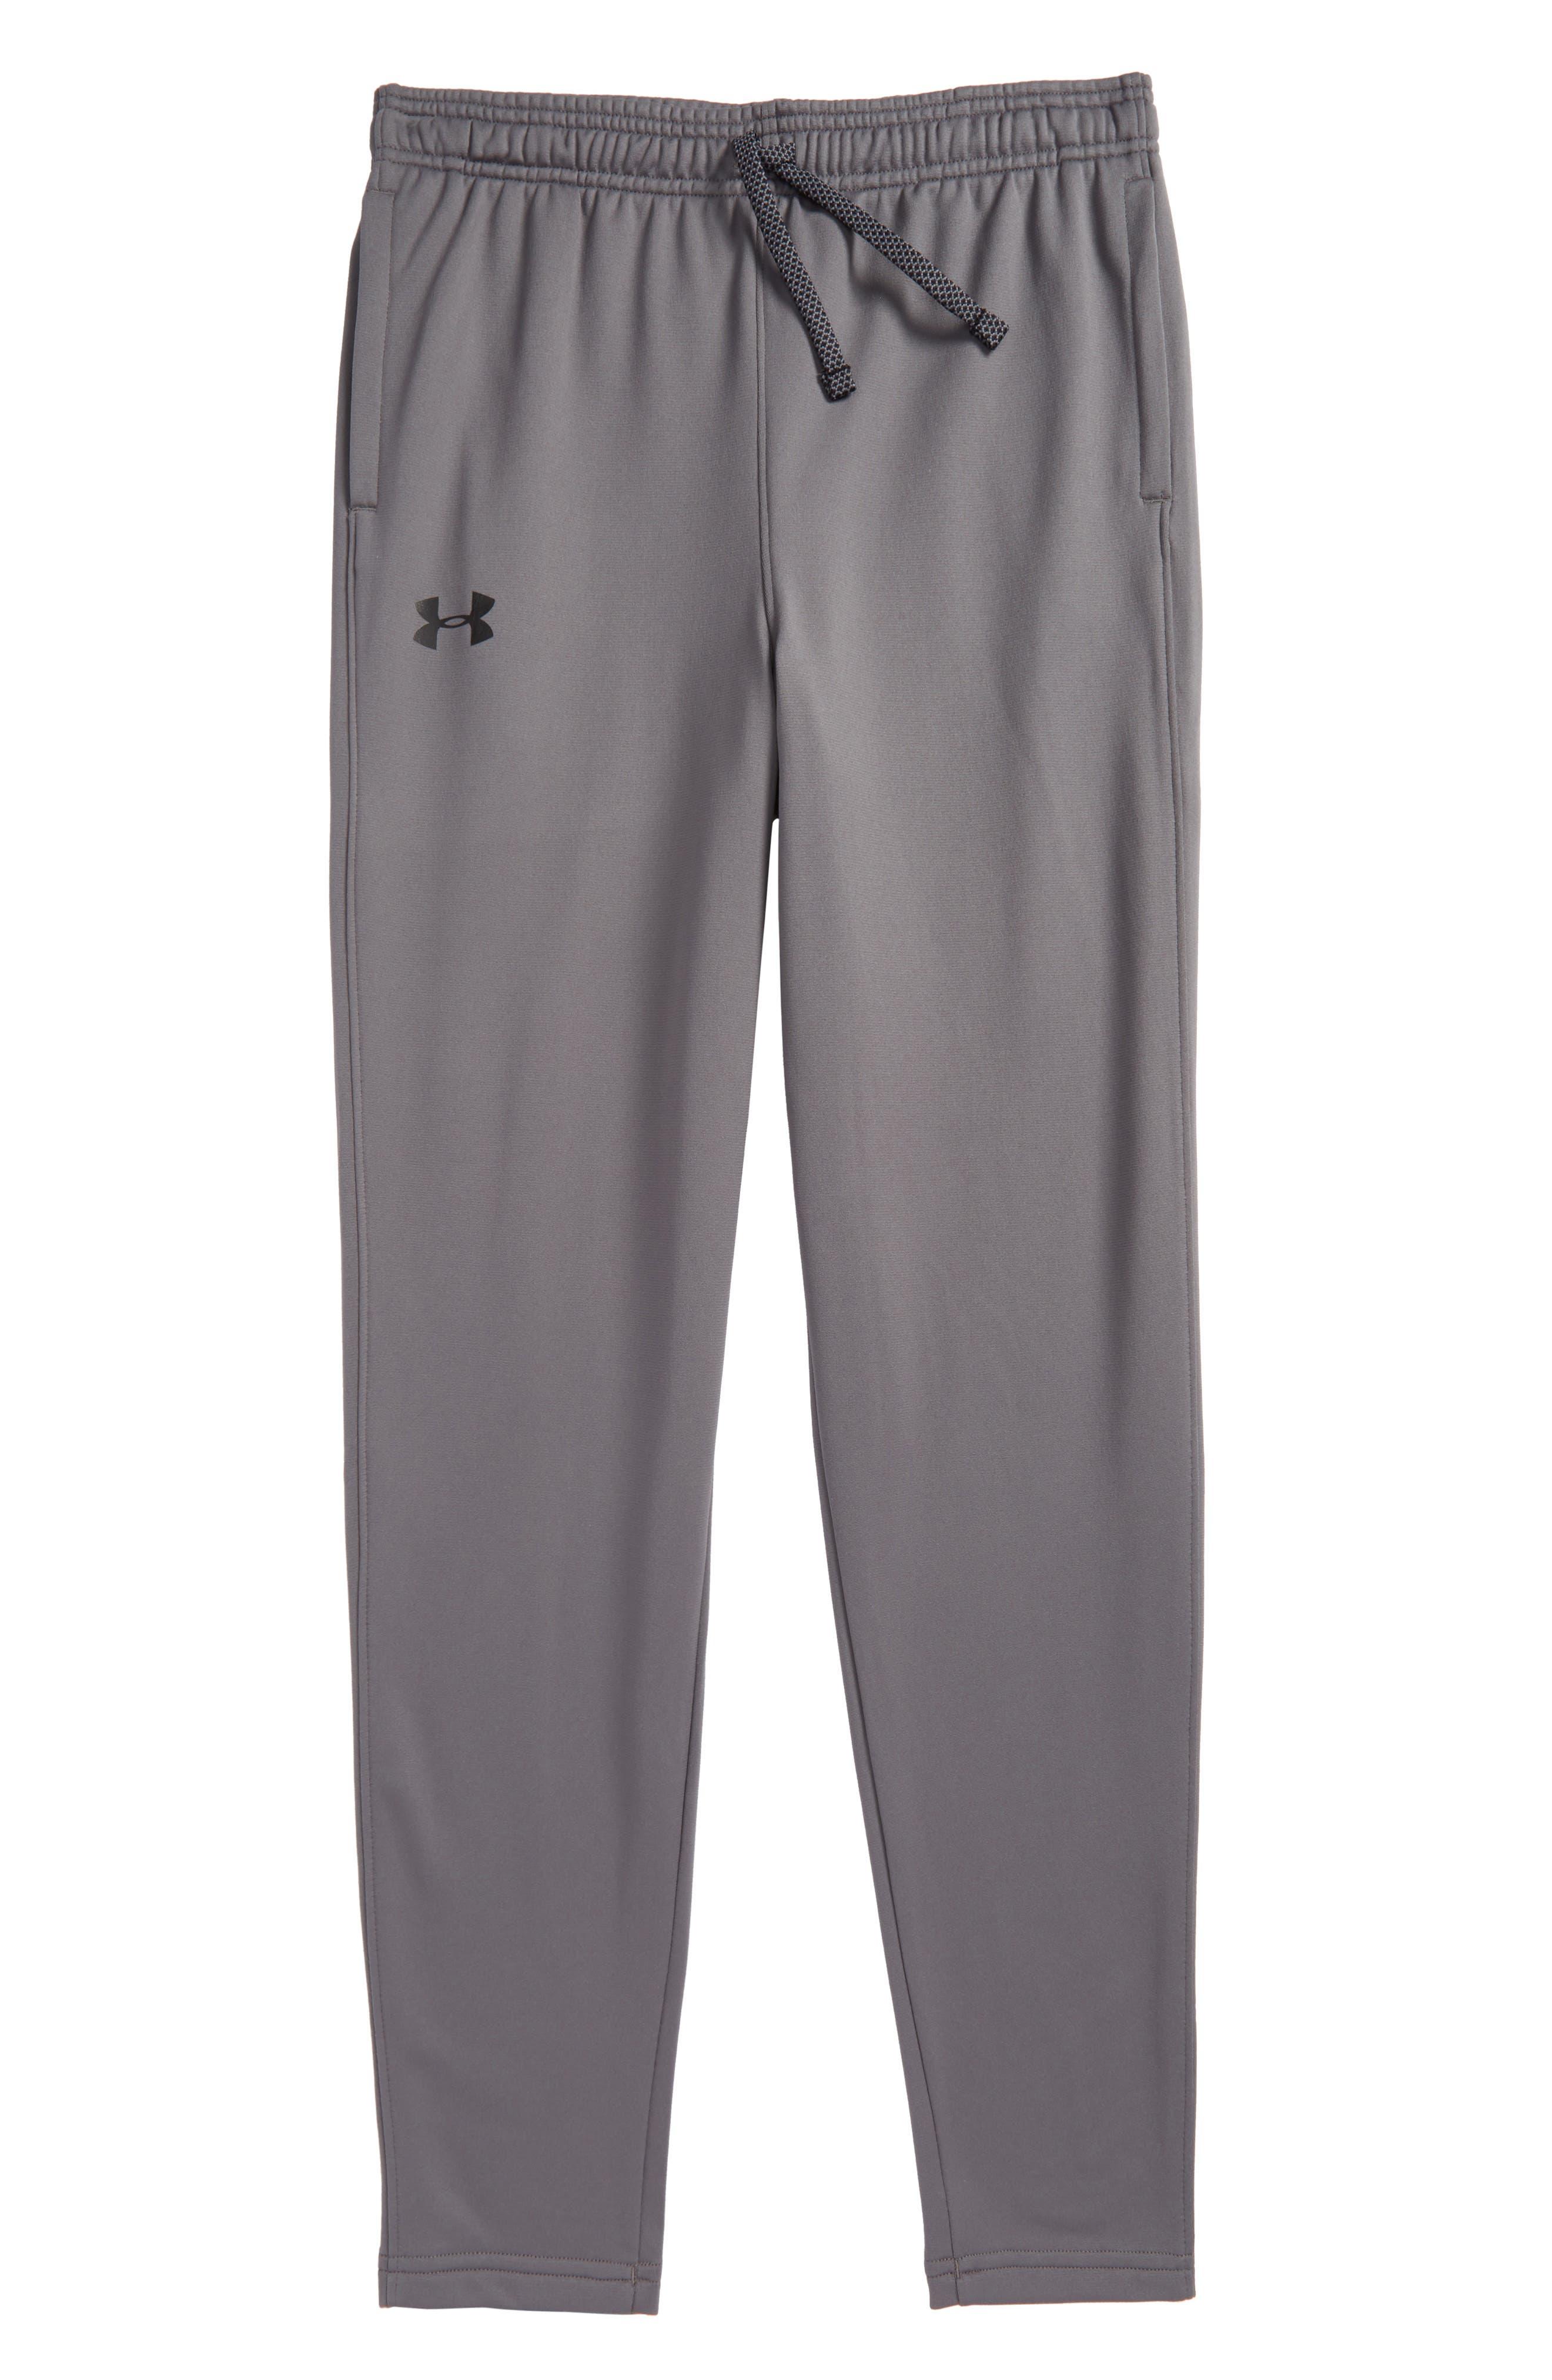 Brawler Tapered Sweatpants,                             Main thumbnail 1, color,                             Graphite/ Black